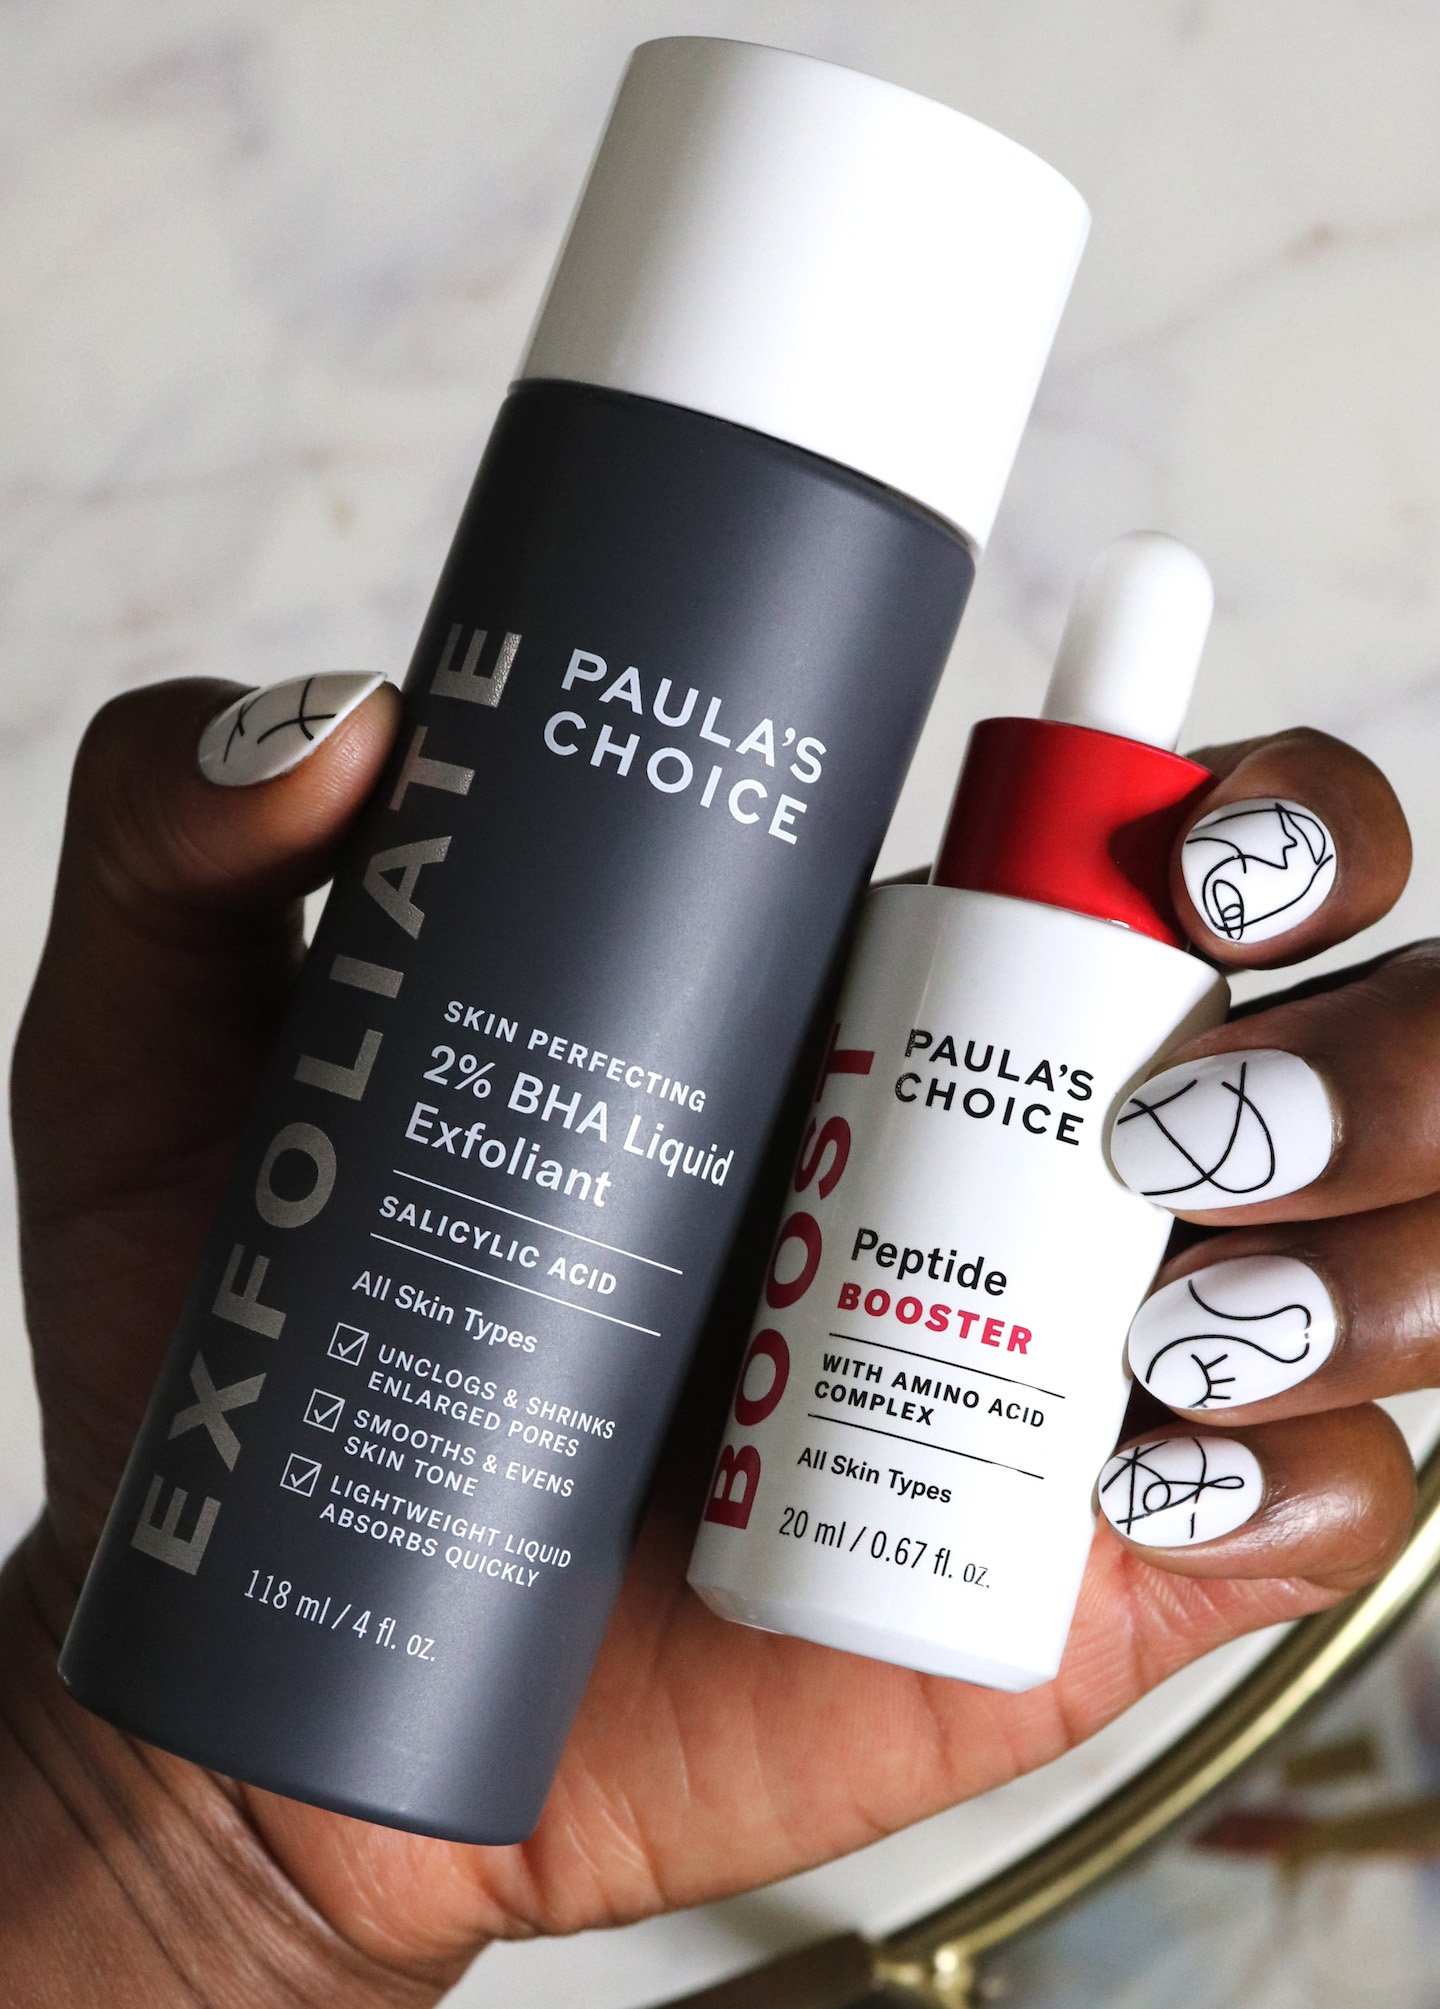 Paula's Choice Peptide Booster & BHA 2% Liquid